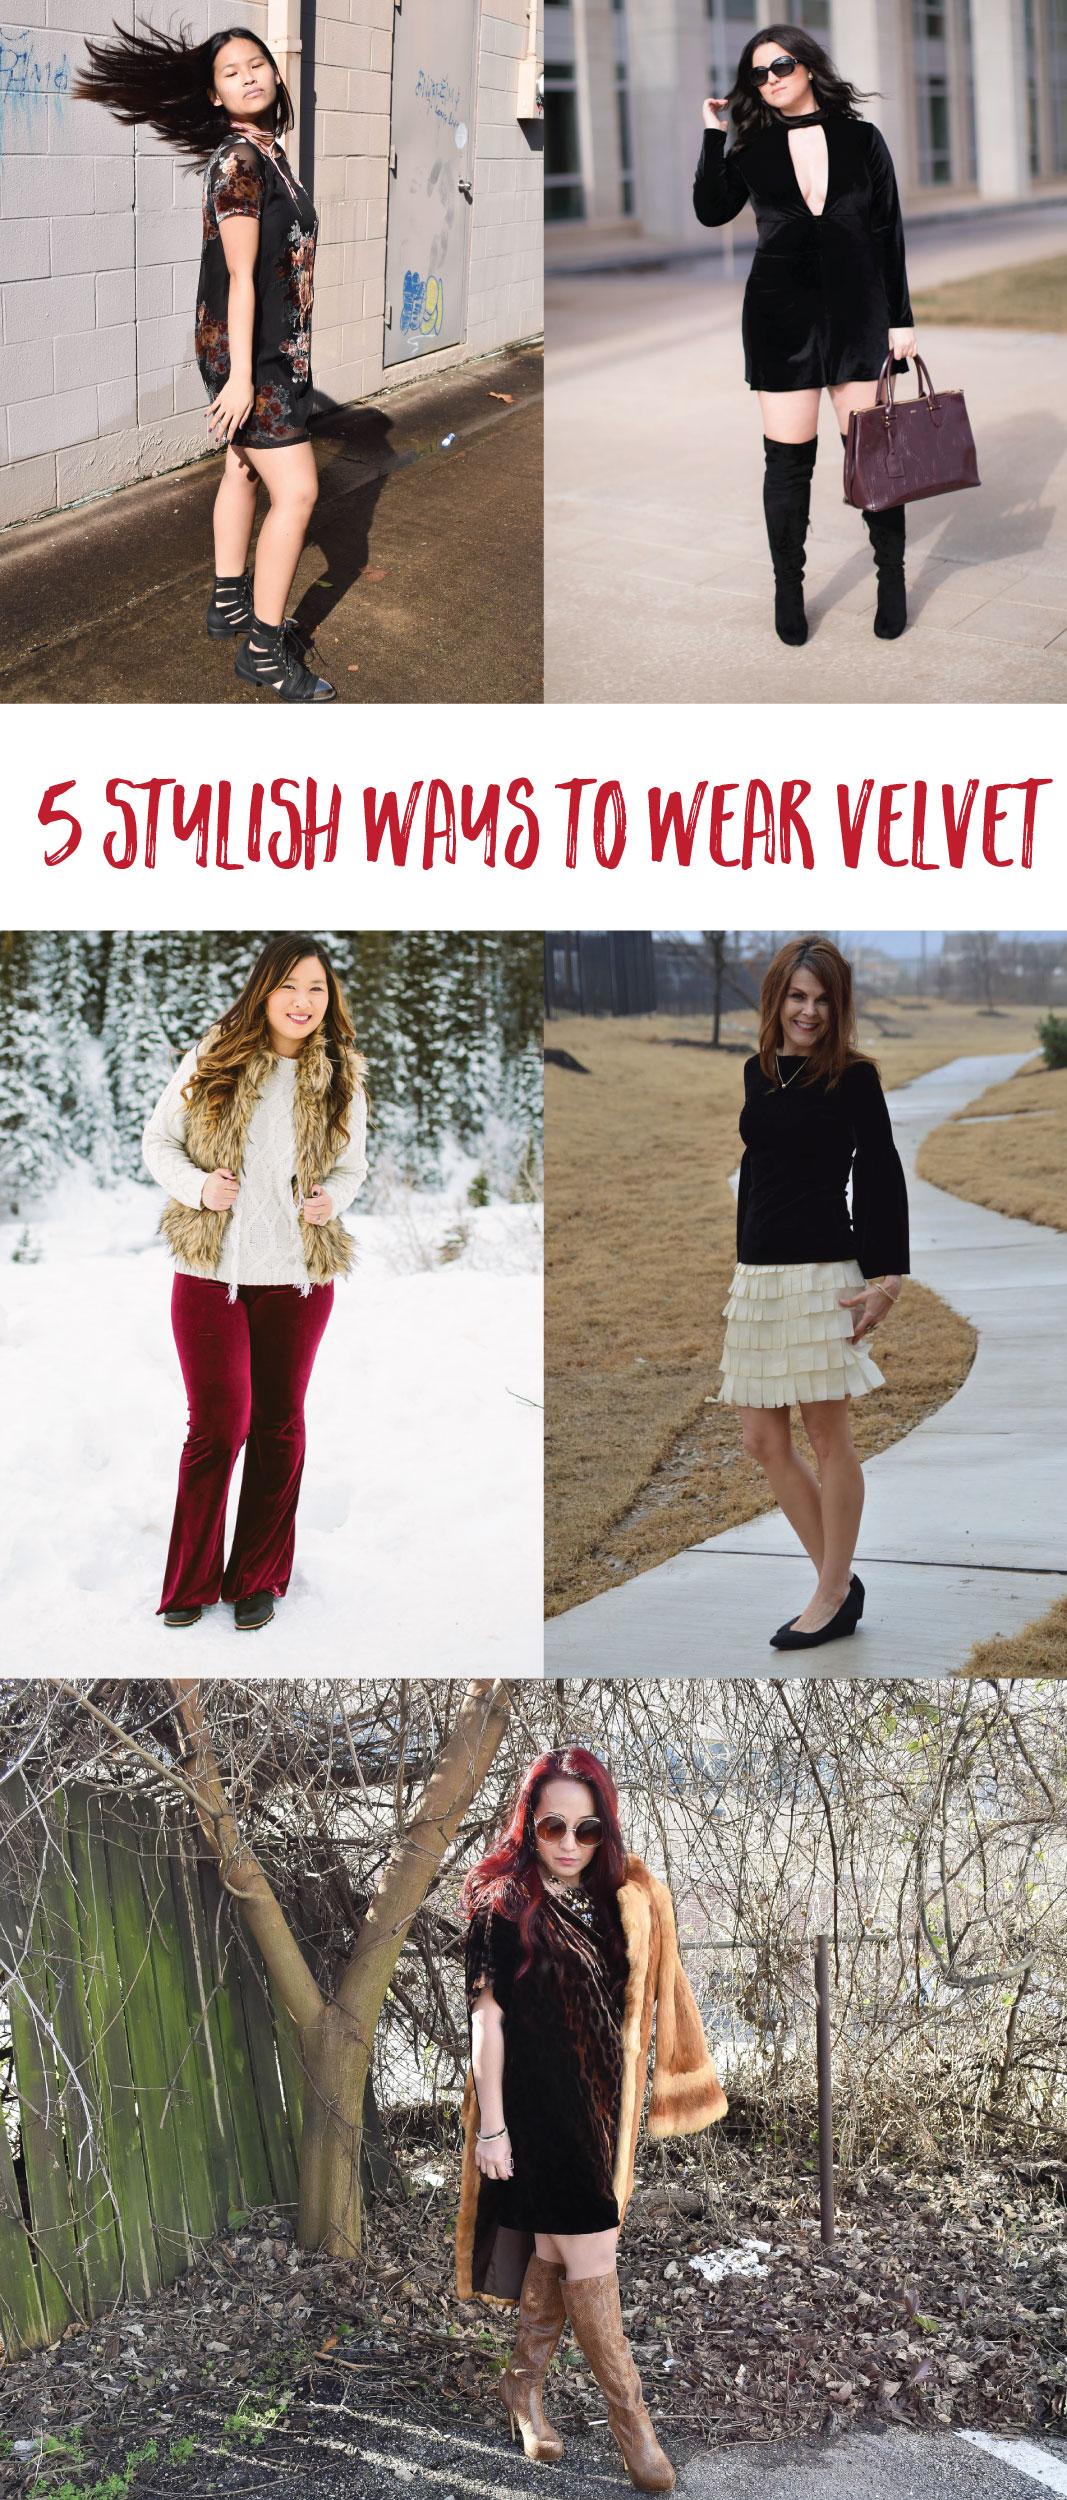 5 Stylish Ways To Wear Velvet